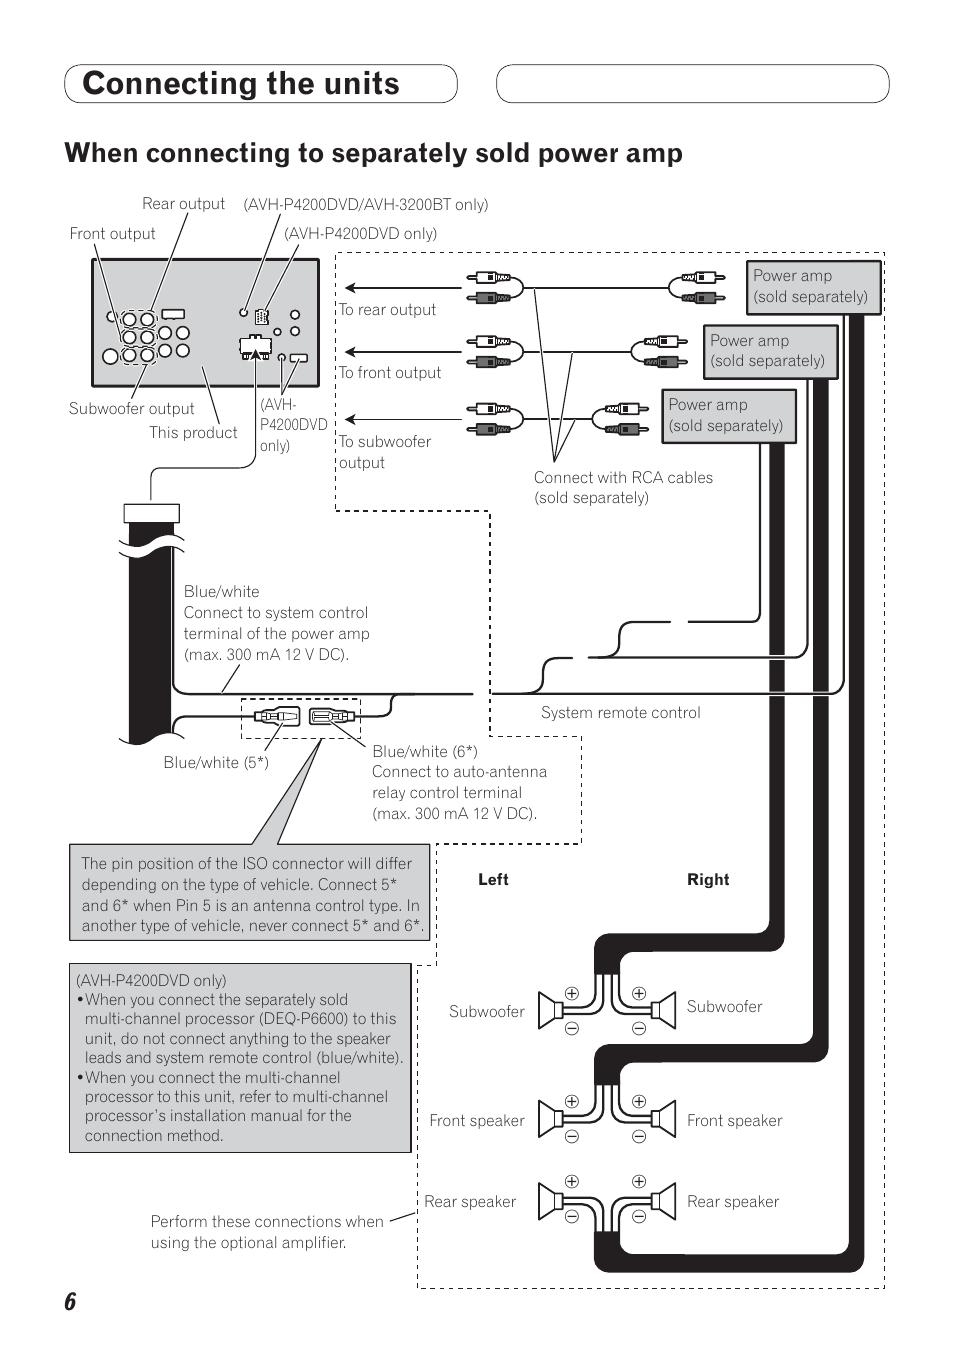 hight resolution of wiring diagram for pioneer avh p4200dvd wiring diagram pioneer avh p3100dvd wiring harness pioneer avh p4000dvd